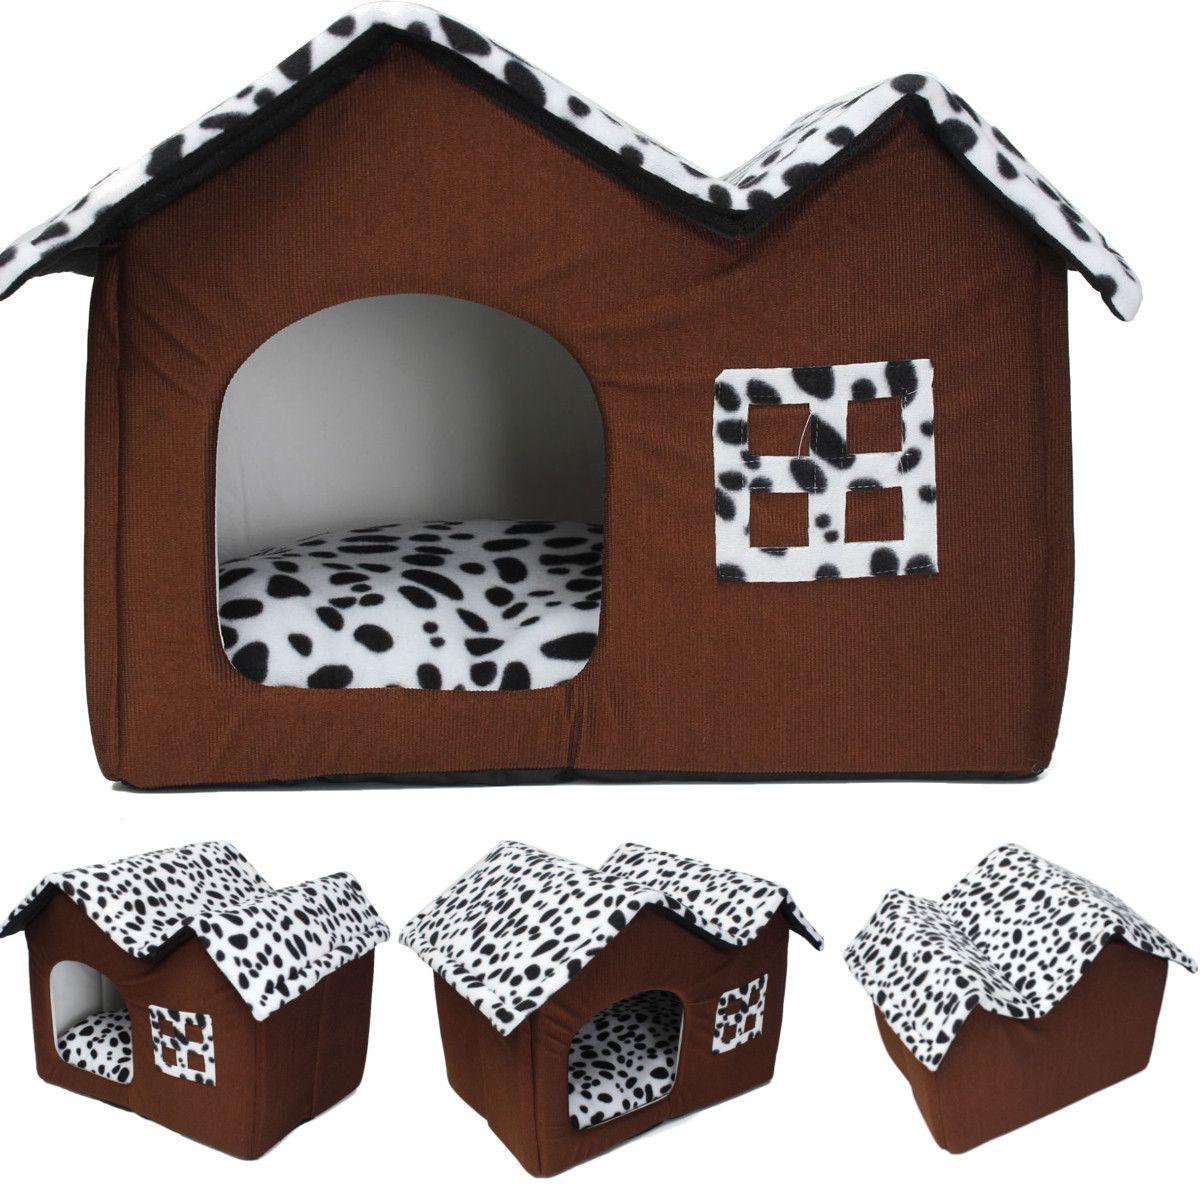 Portable Luxury Spot Double Top Pet House Dog Cat Sleep